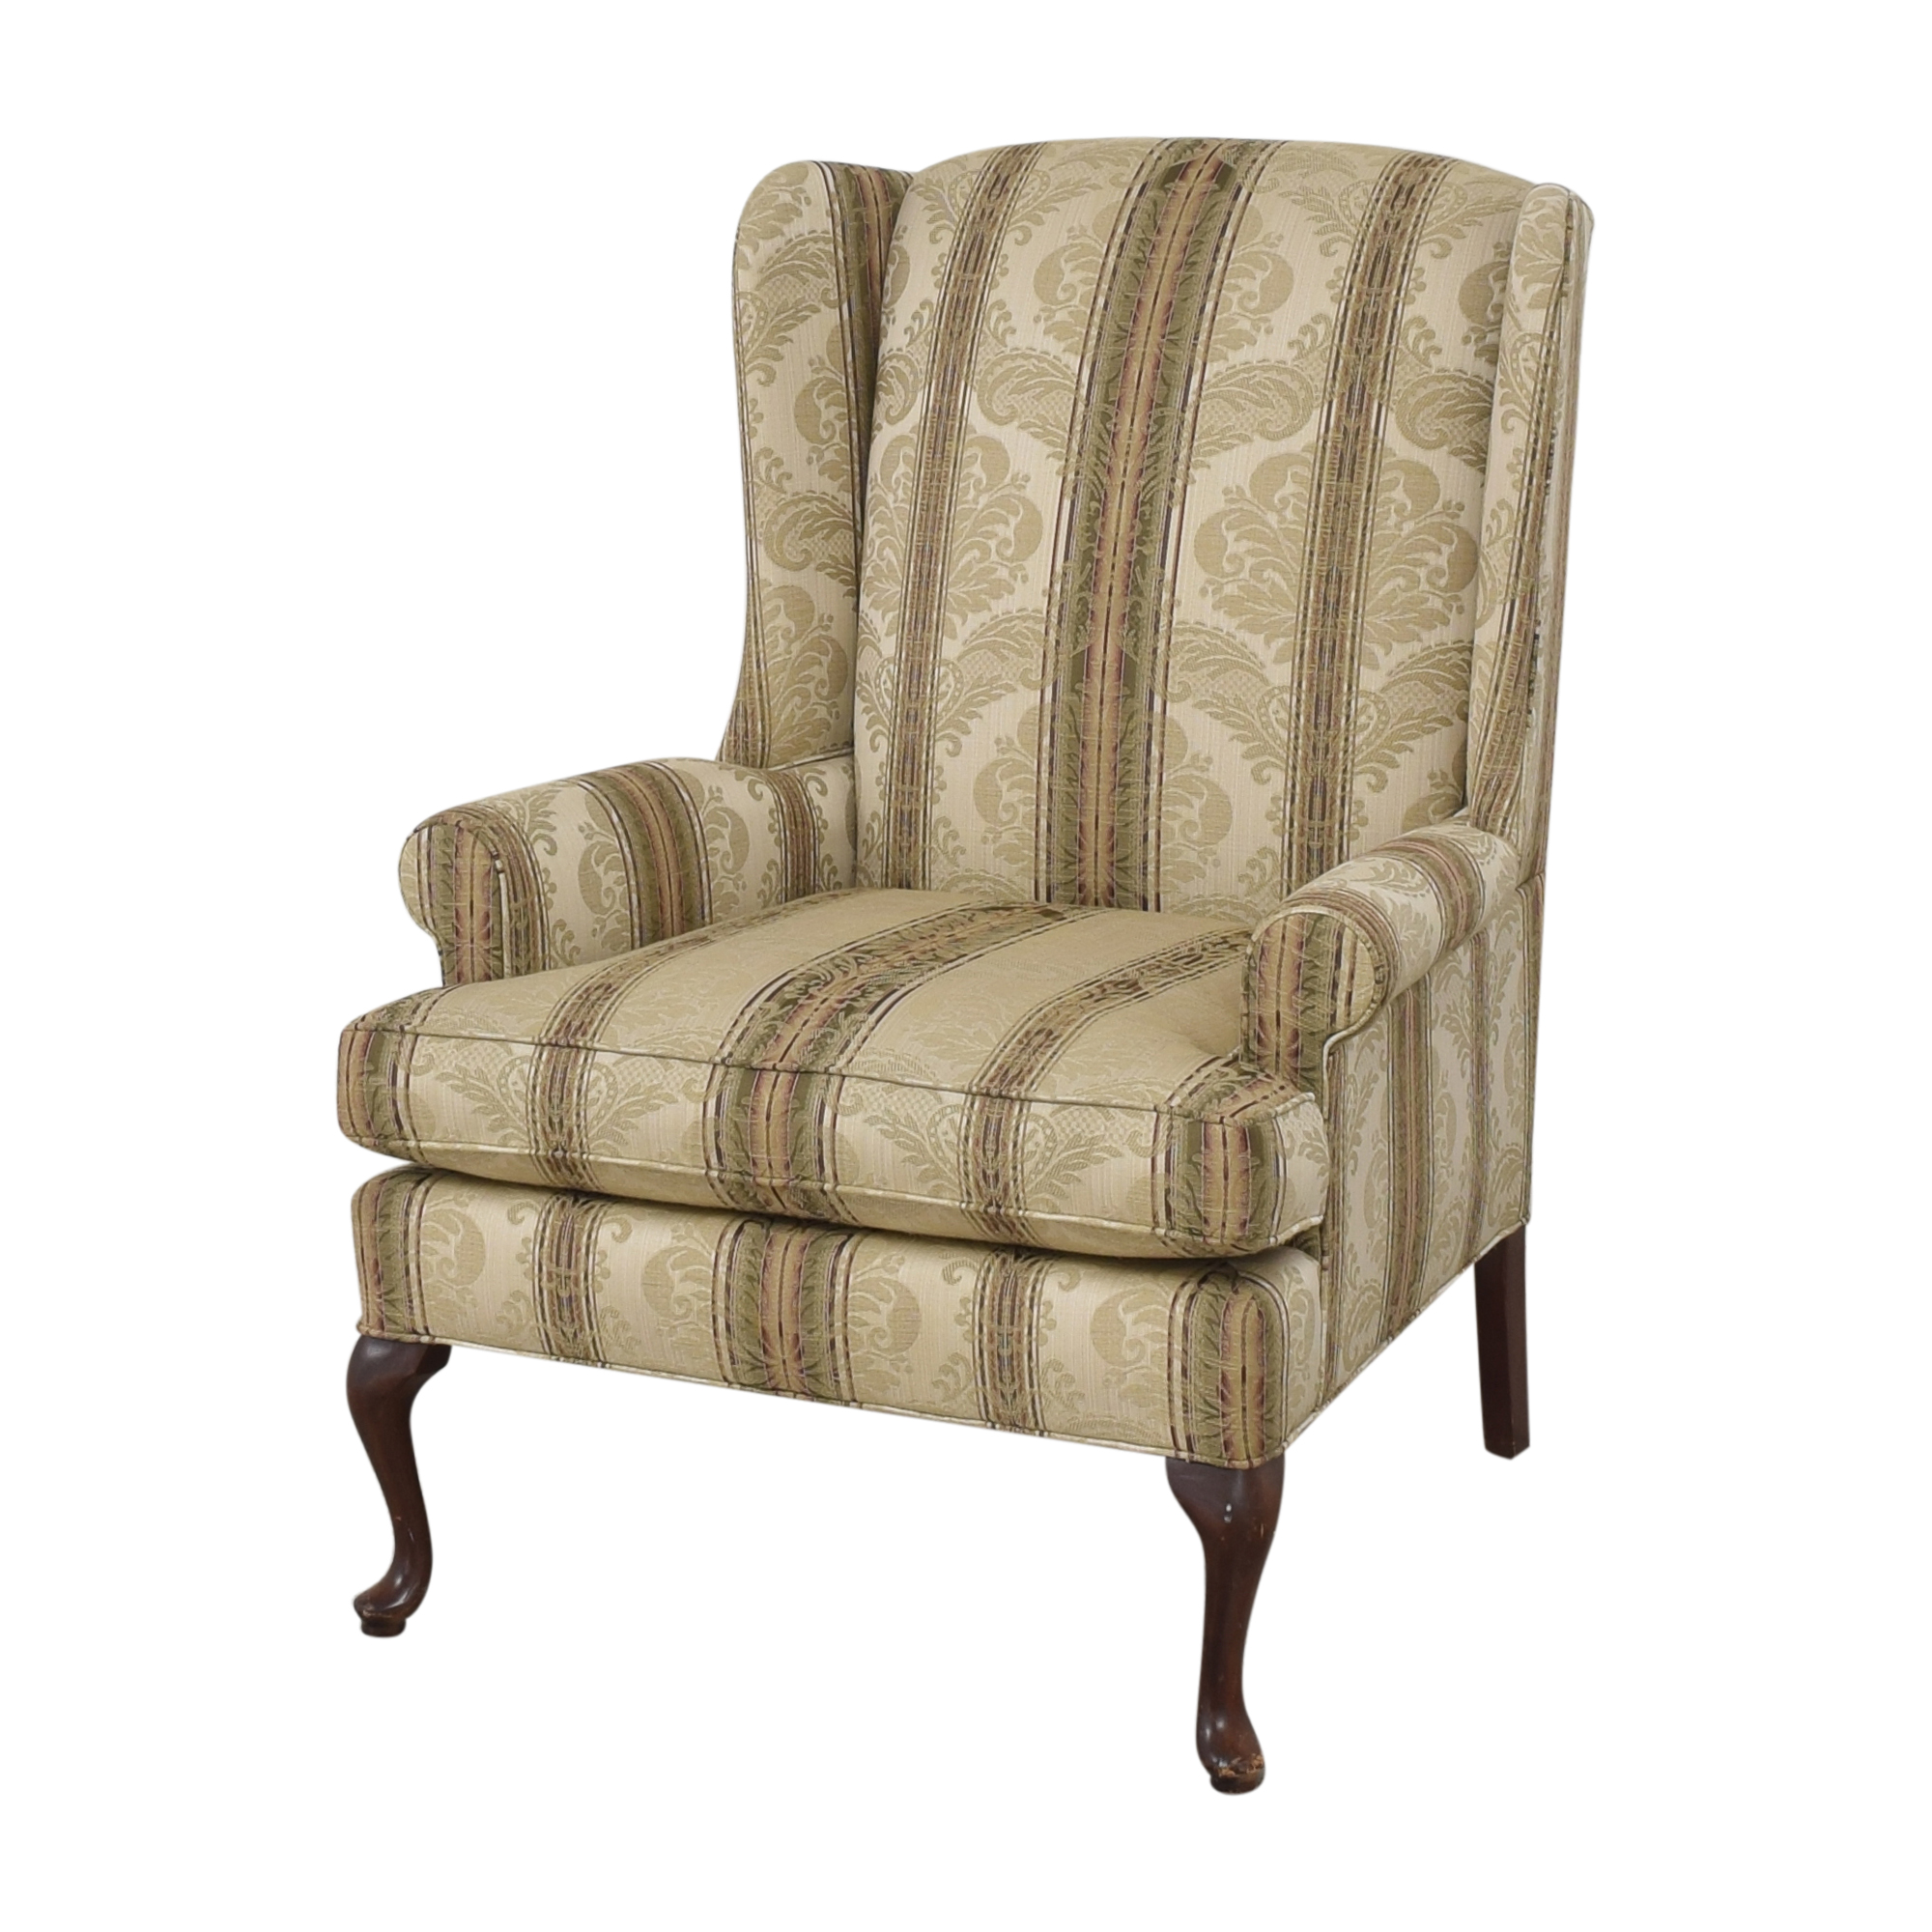 Thomasville Thomasville Damask Striped Wingback Chair price